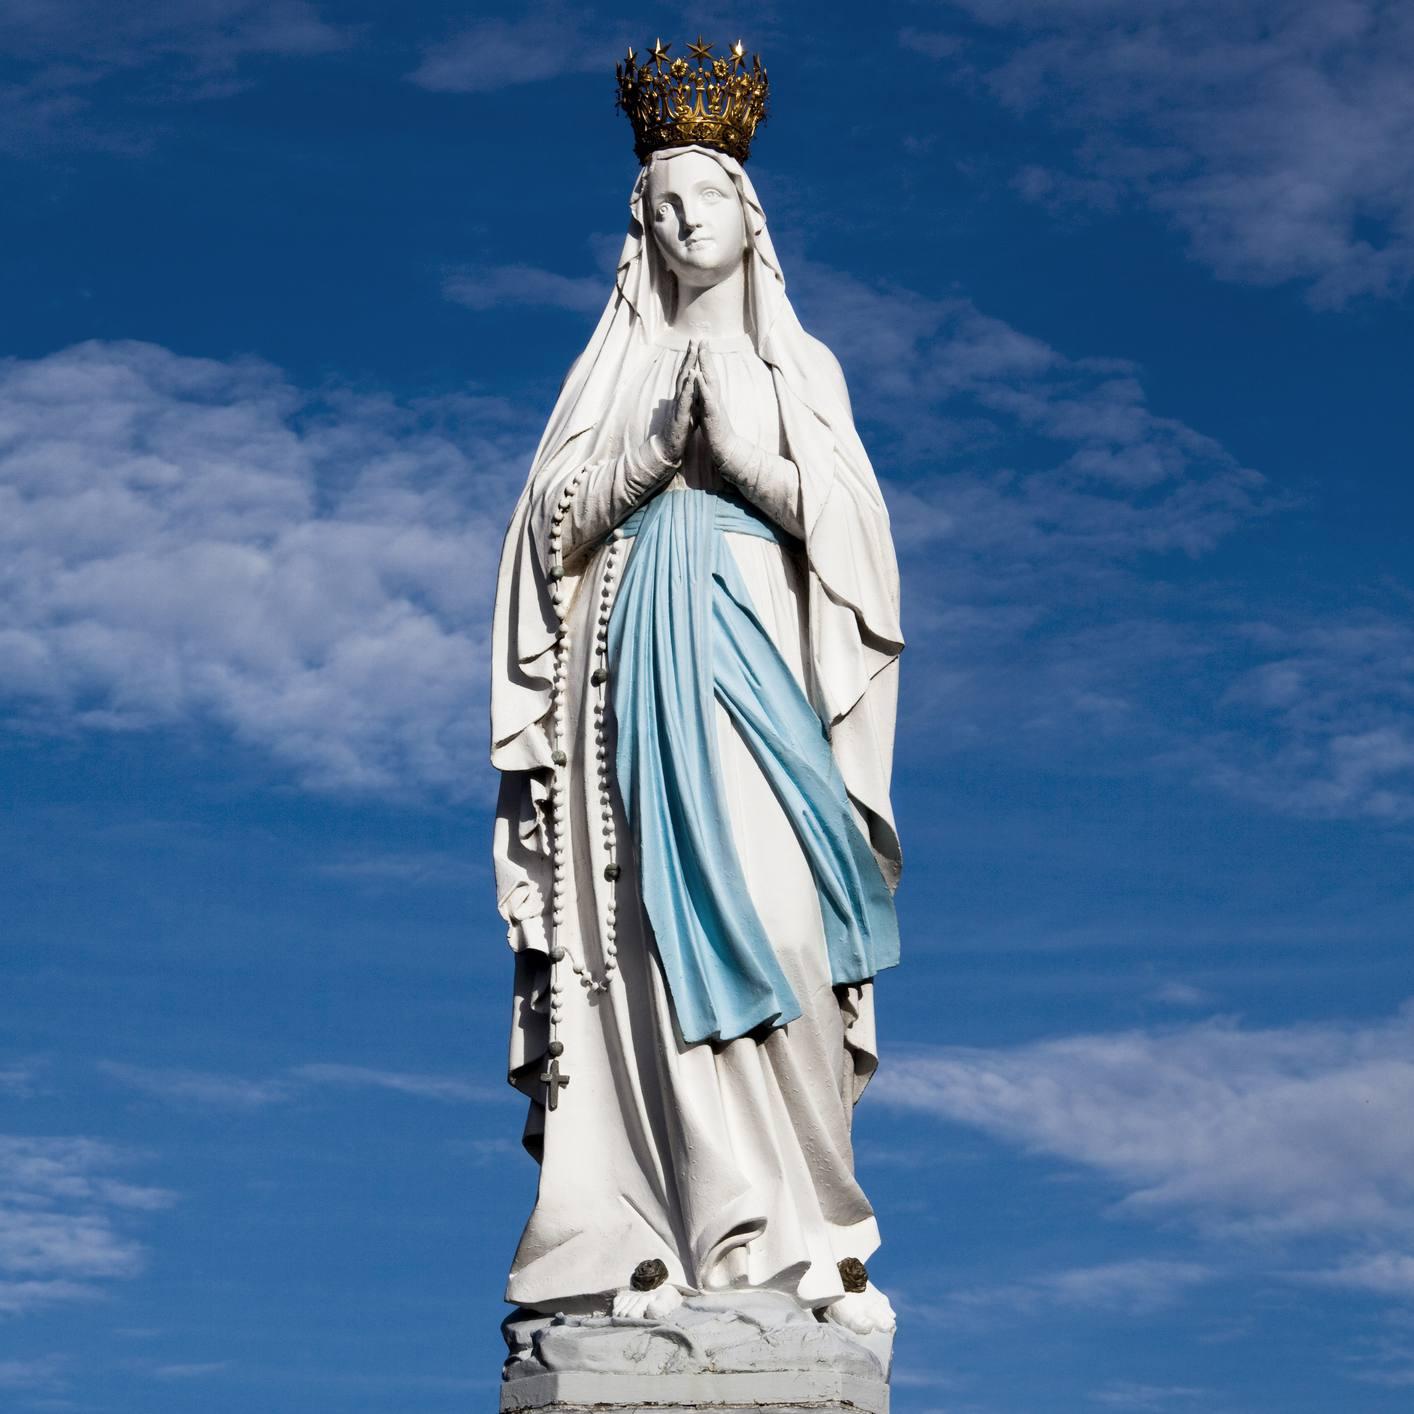 Southwestern France, Lourdes, statue of Virgin Mary